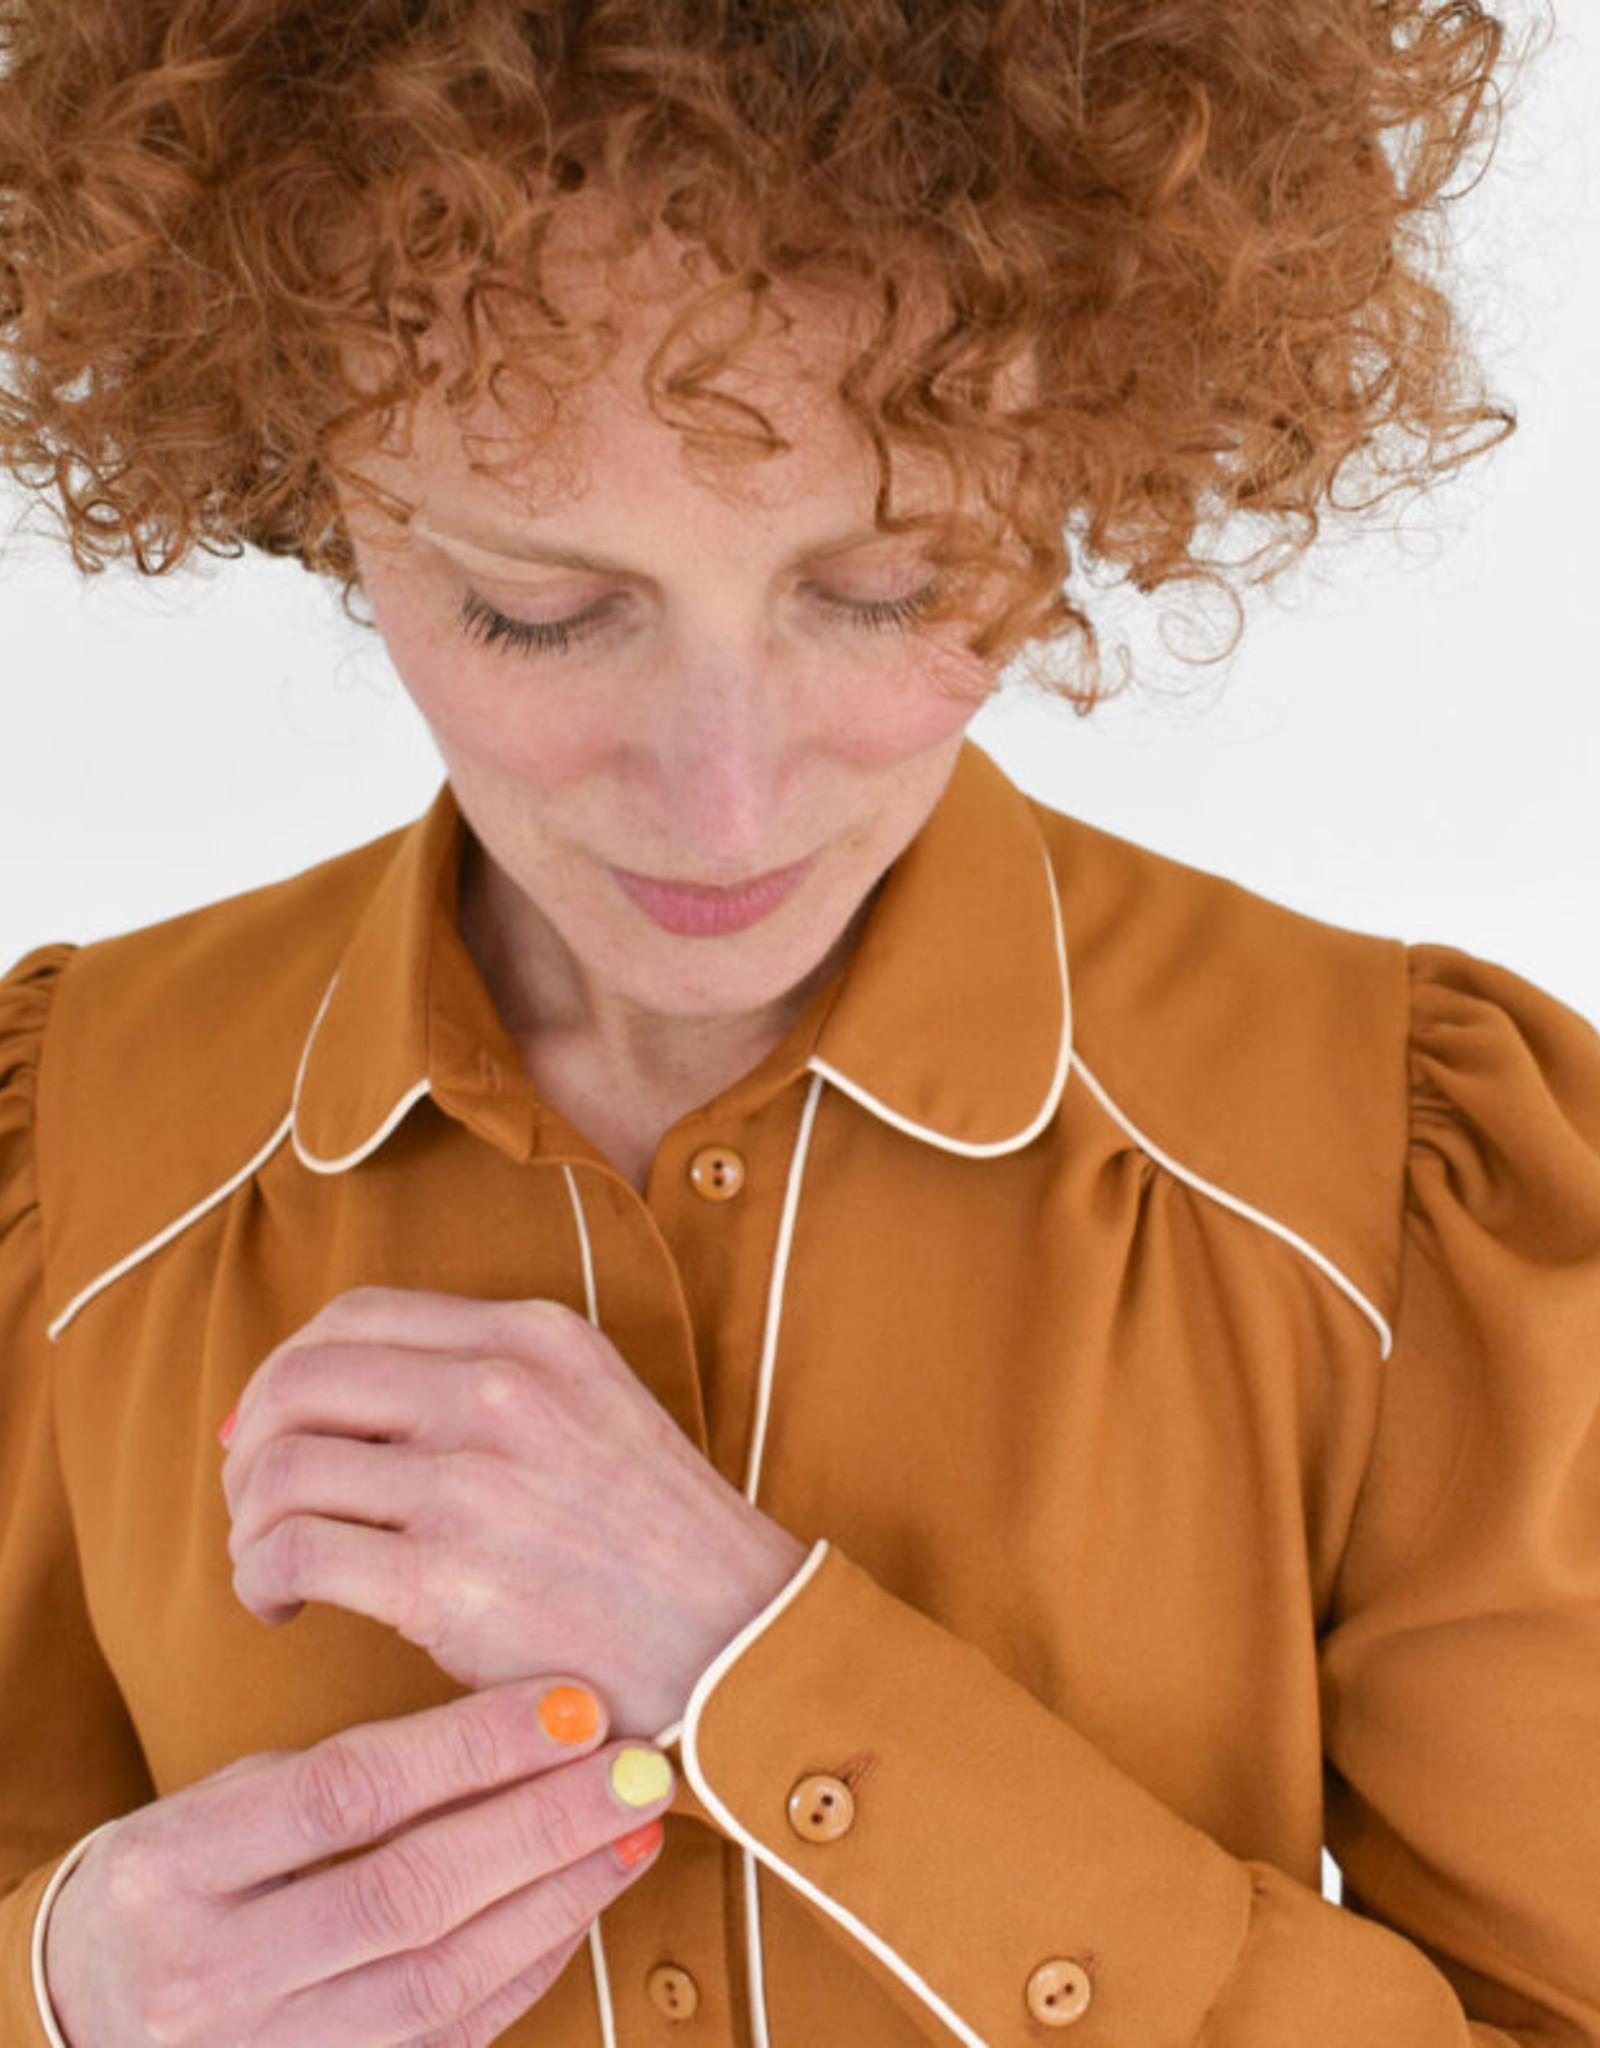 Bel'Etoile Harriete Blouse voor dames - Bel'Etoile & Sew it Curly